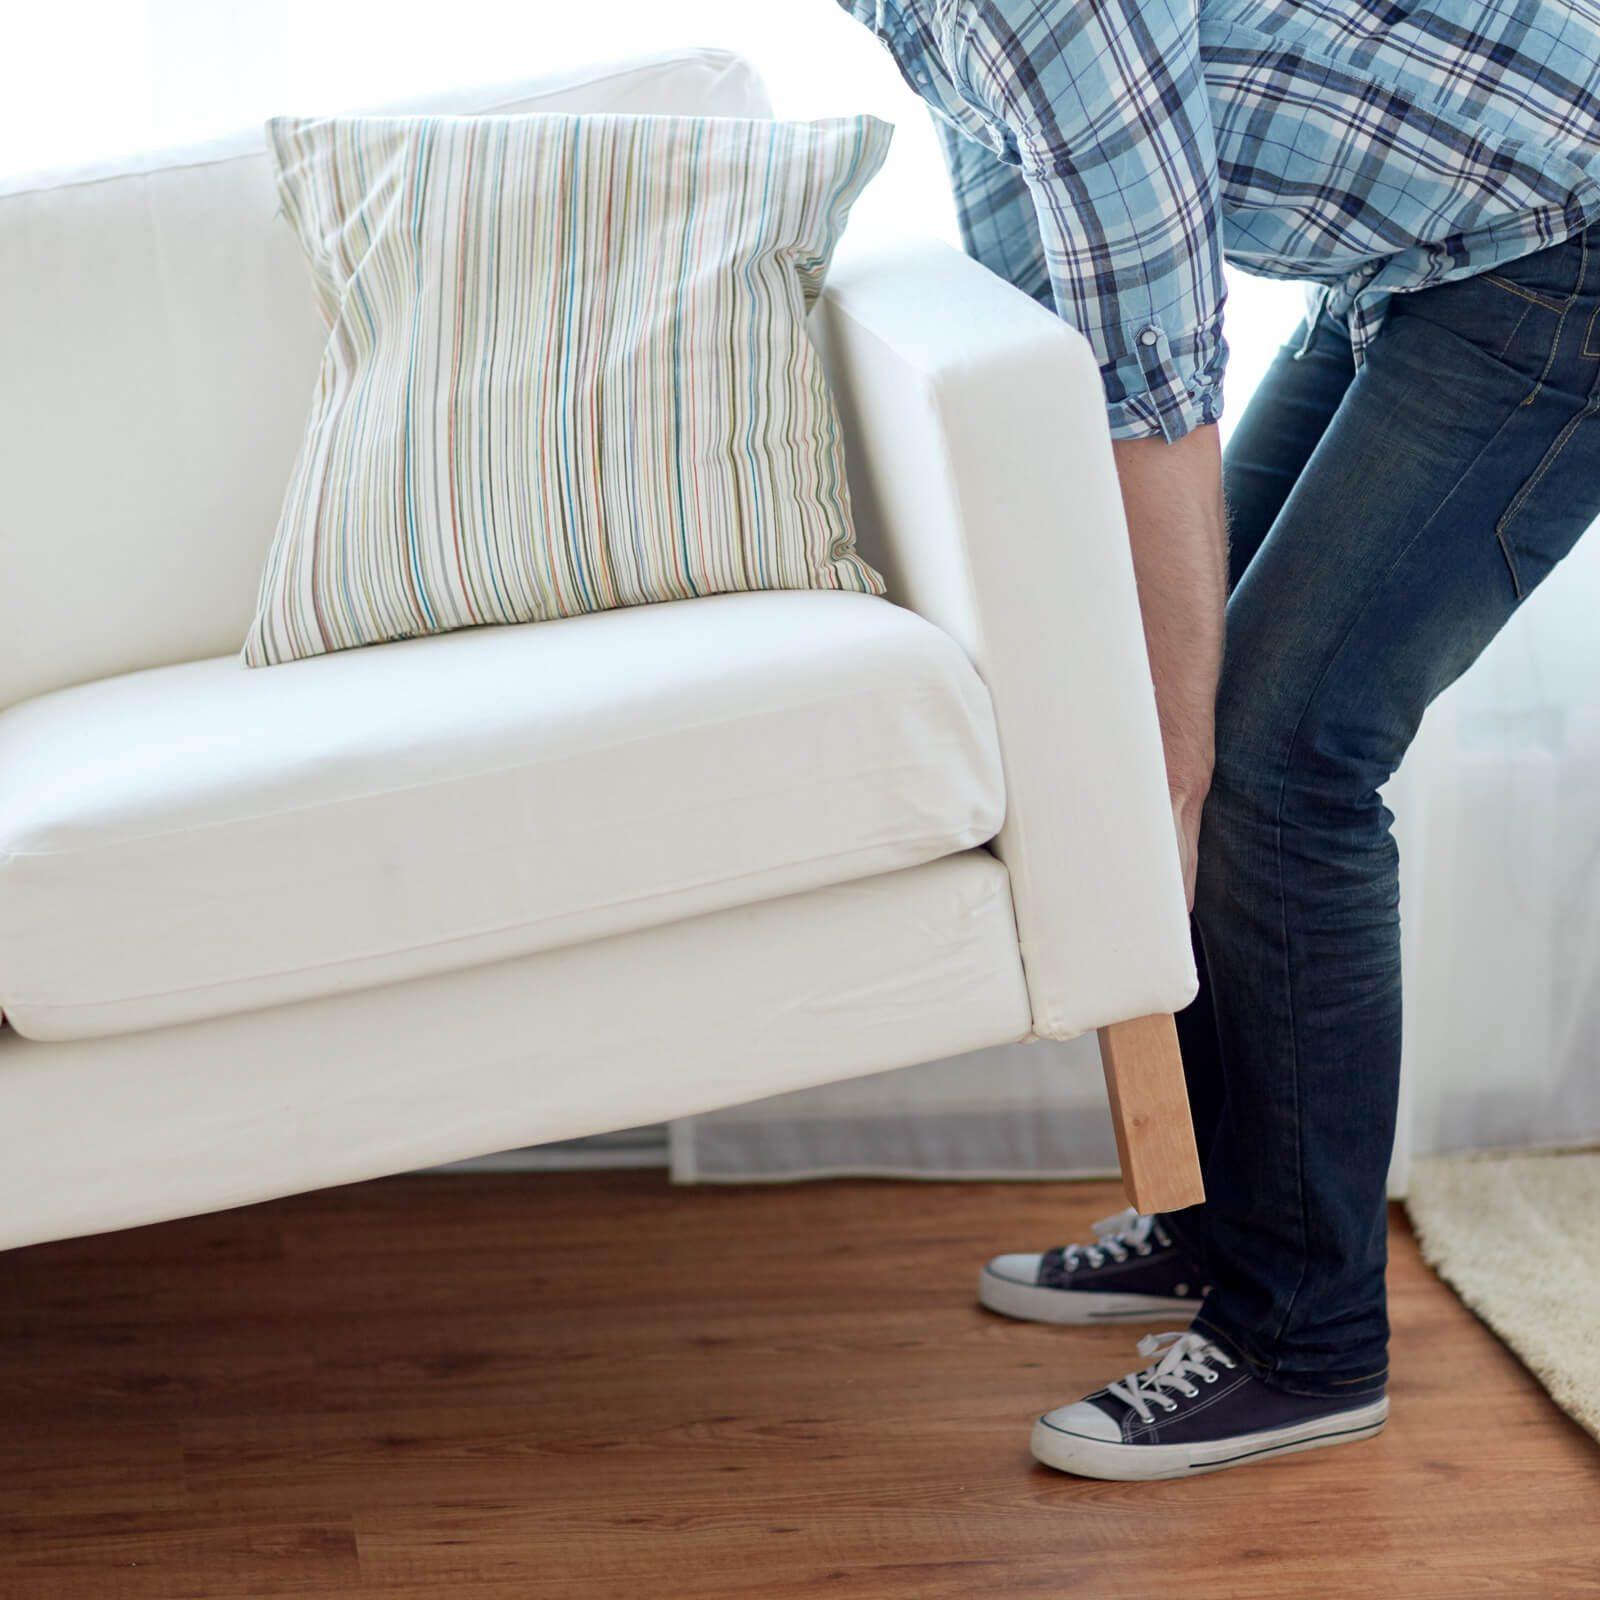 Moving furniture | Roberts Carpet & Fine Floors